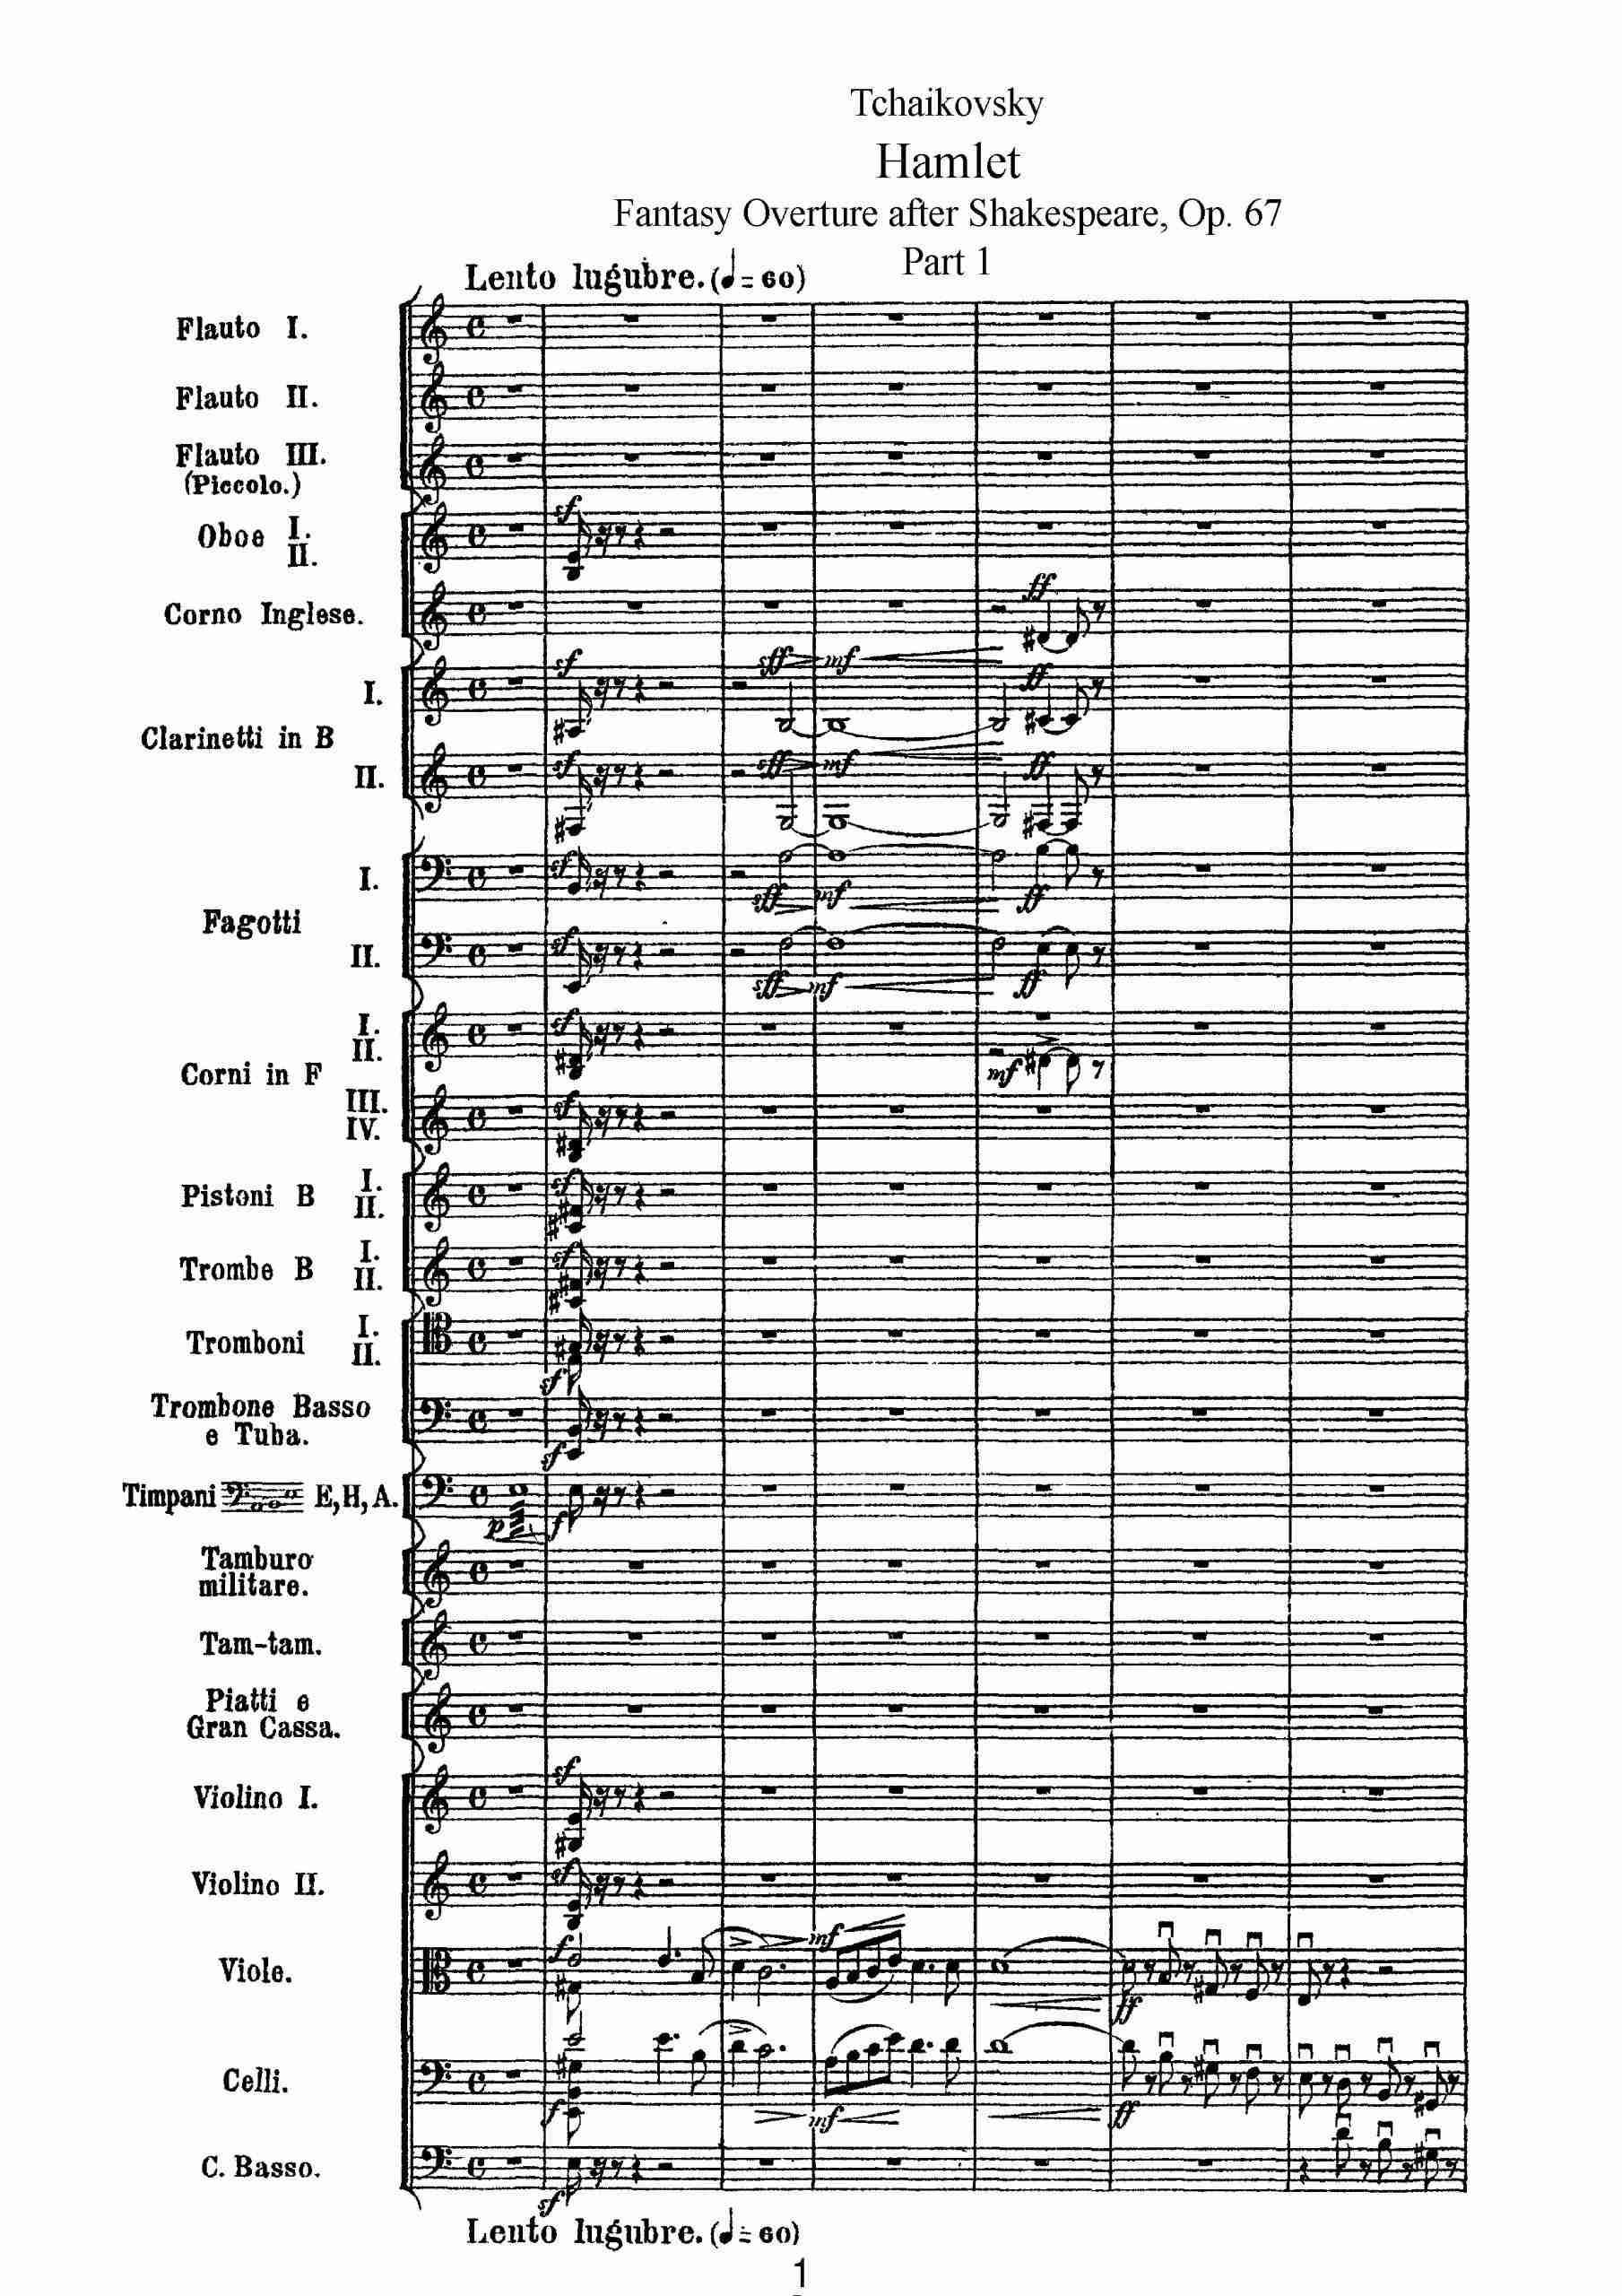 Tchaikovsky, Pyotr - Hamlet (overture-fantasia), Op.67 part 1